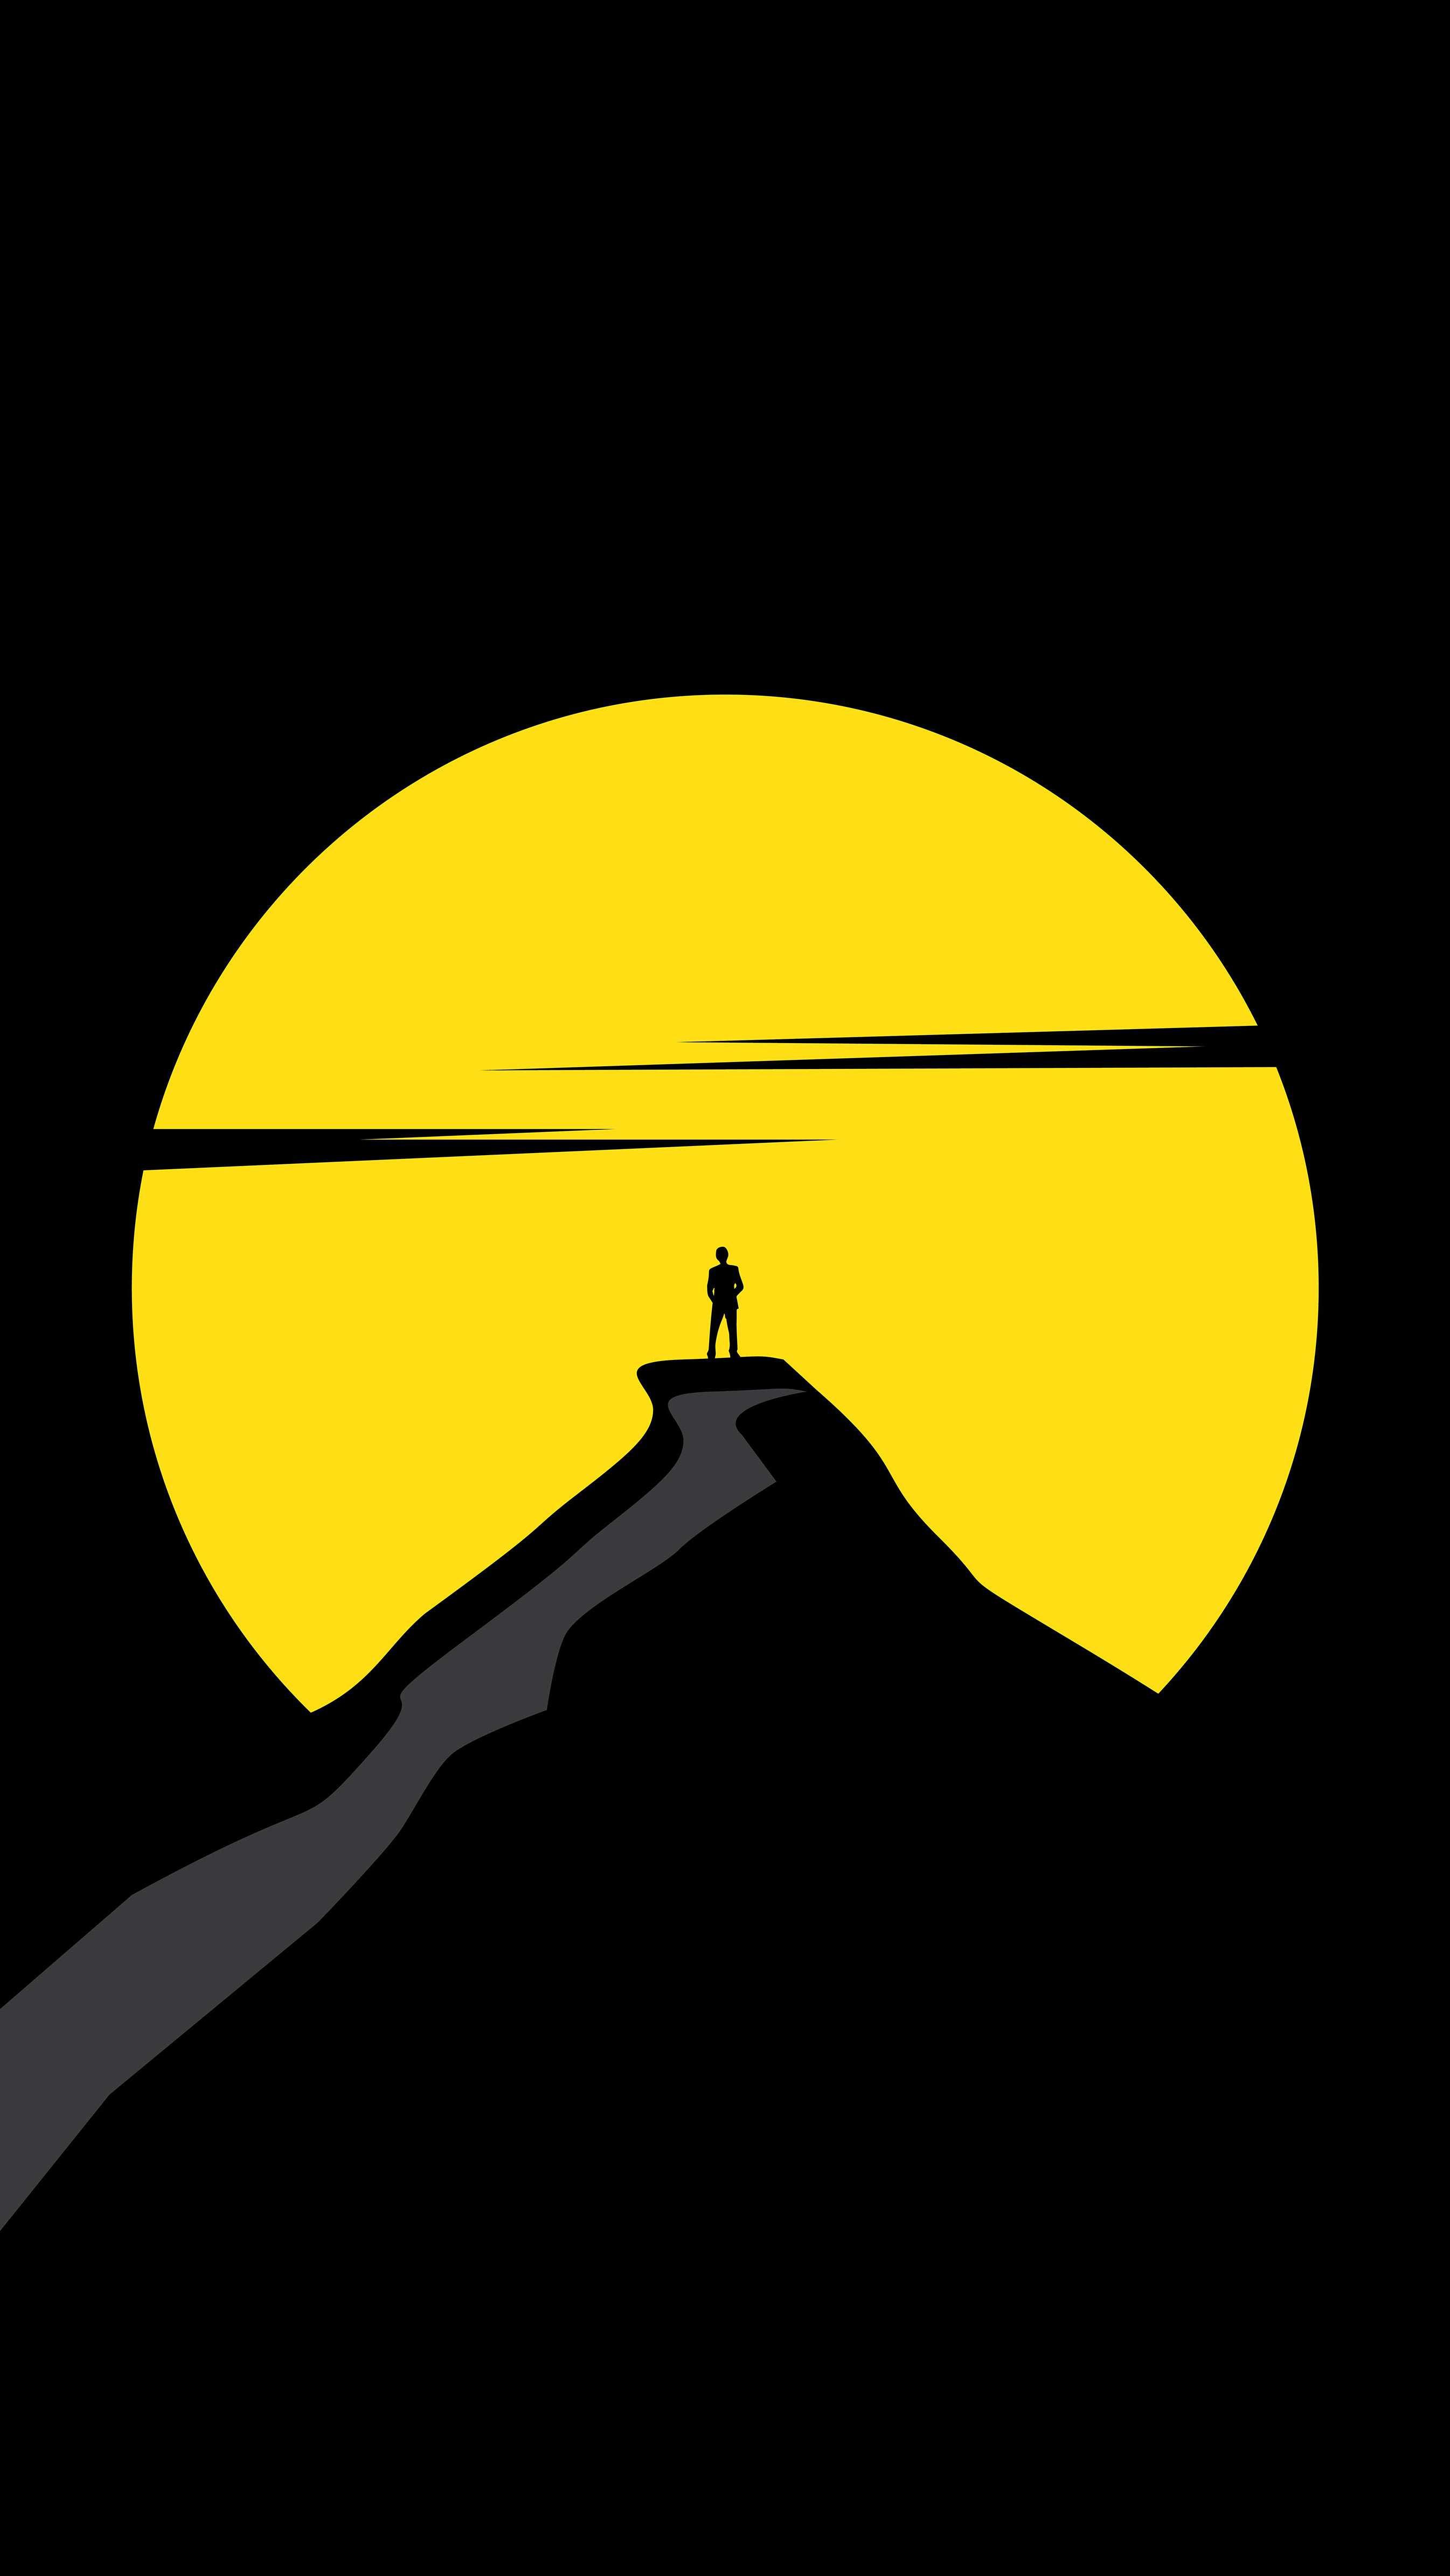 Minimal Yellow Sun iPhone Wallpaper